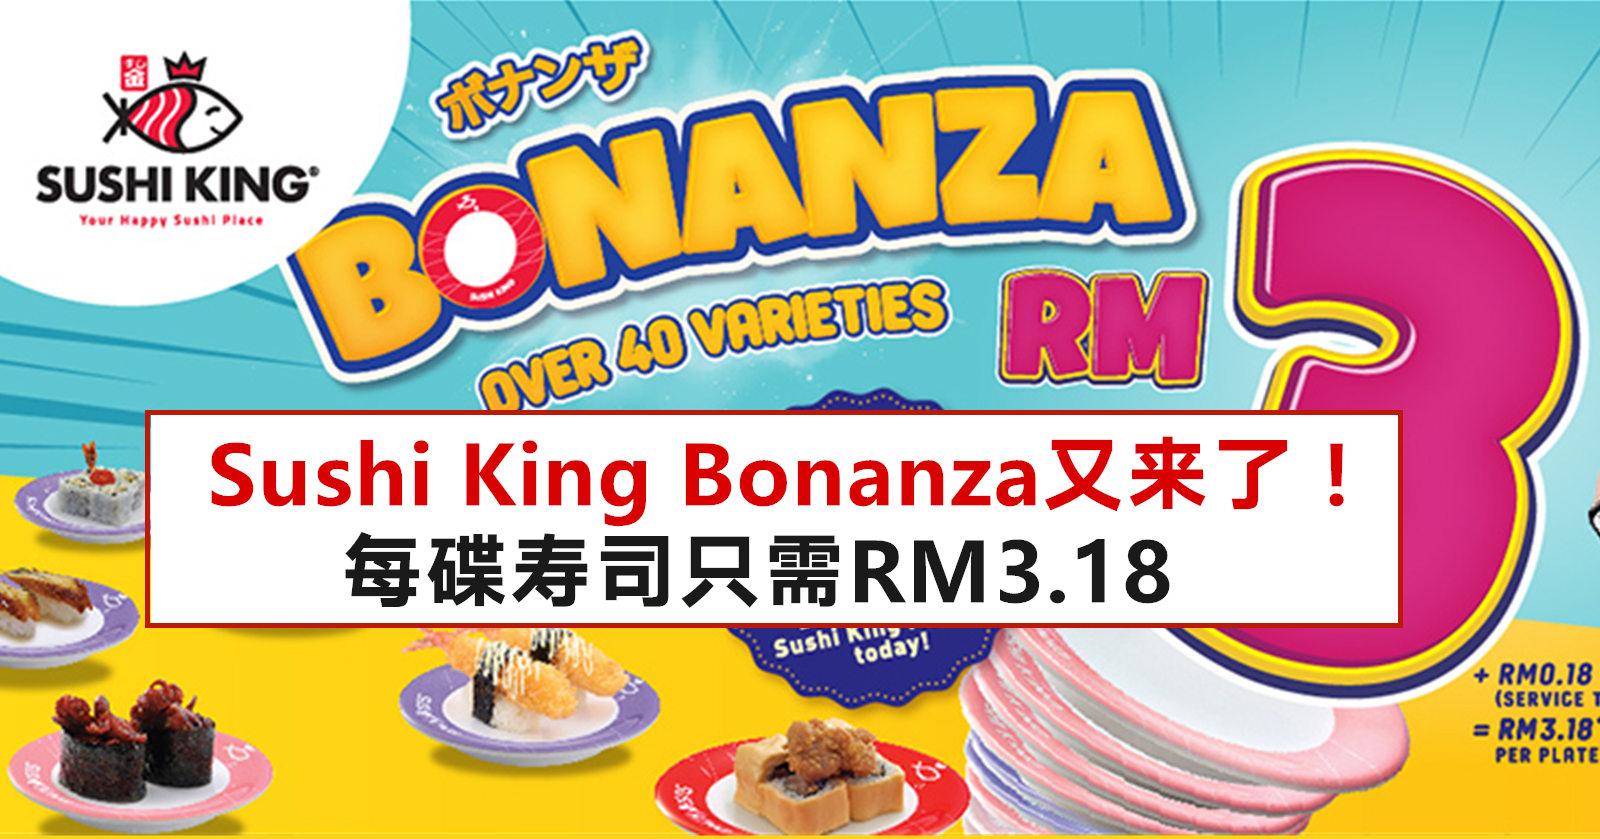 Sushi King Bonanza又来了!每碟寿司只需RM3.18